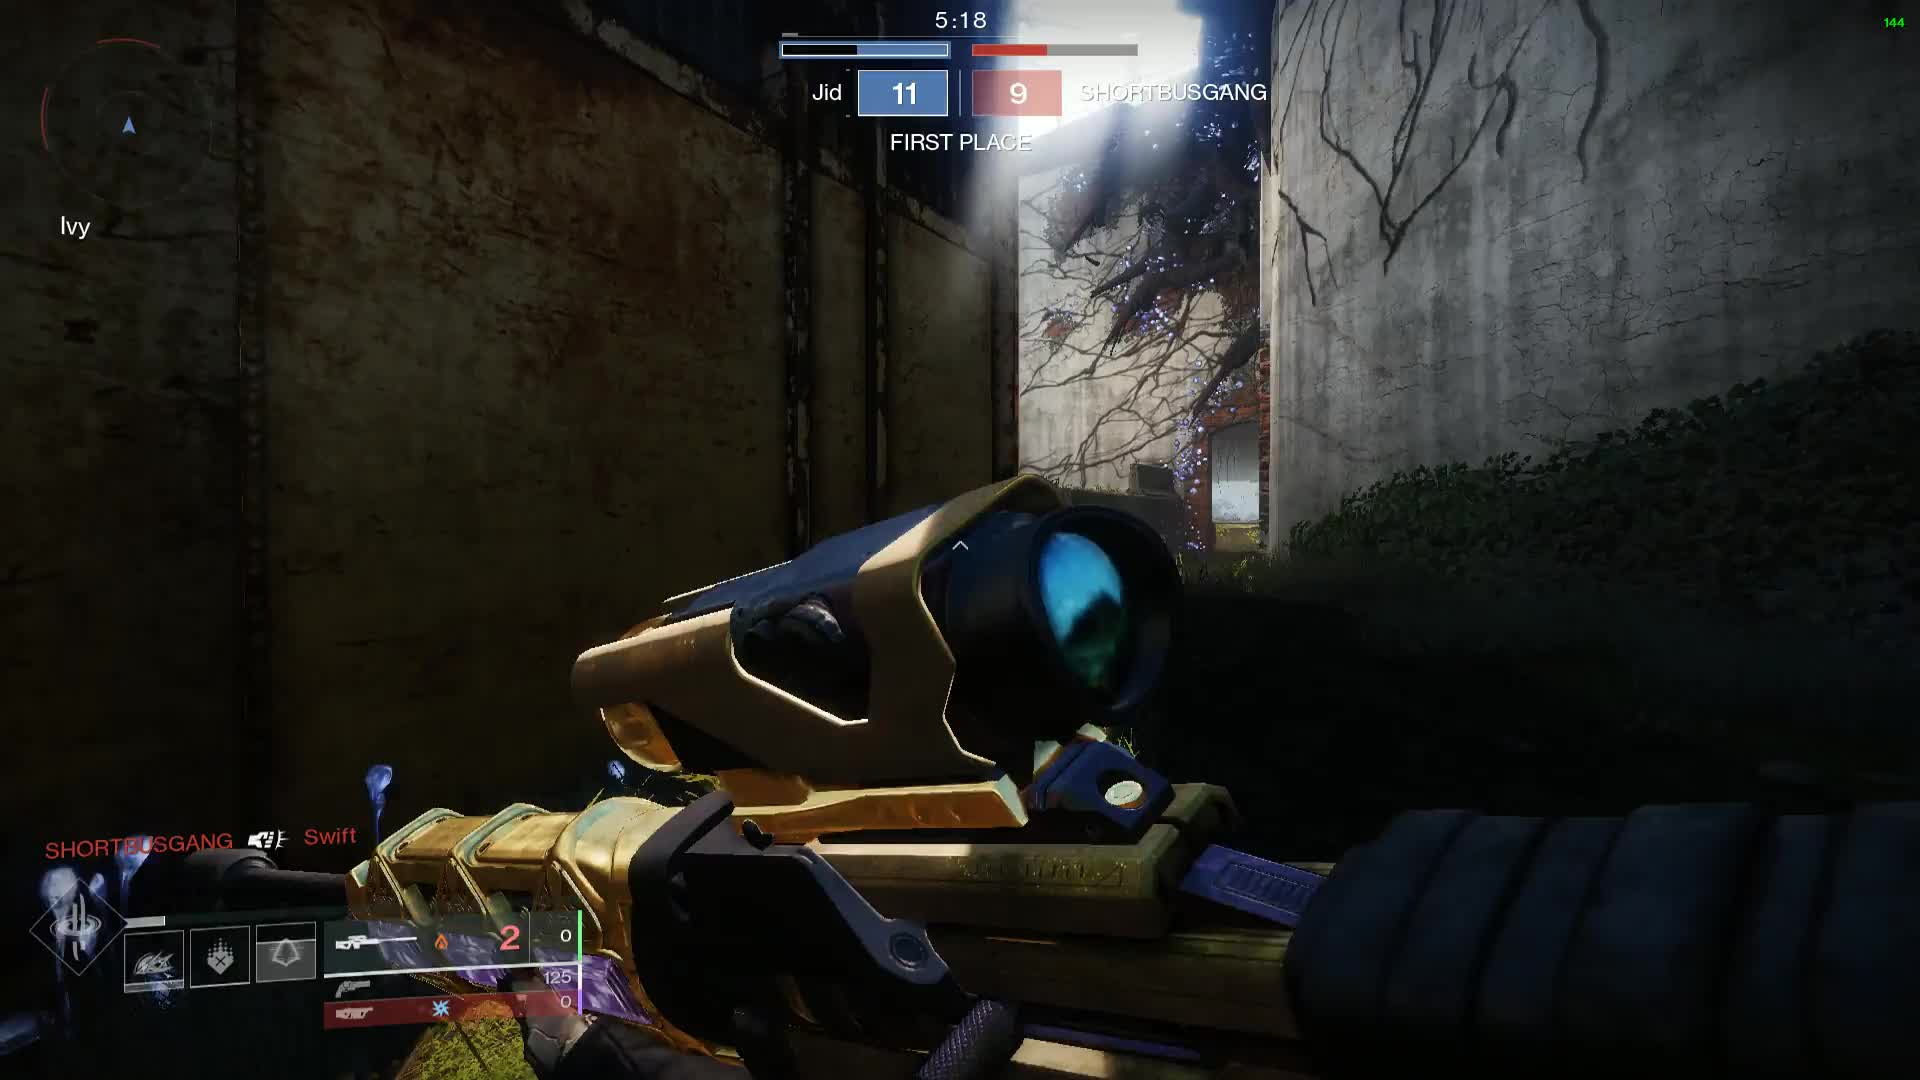 big snipe GIFs